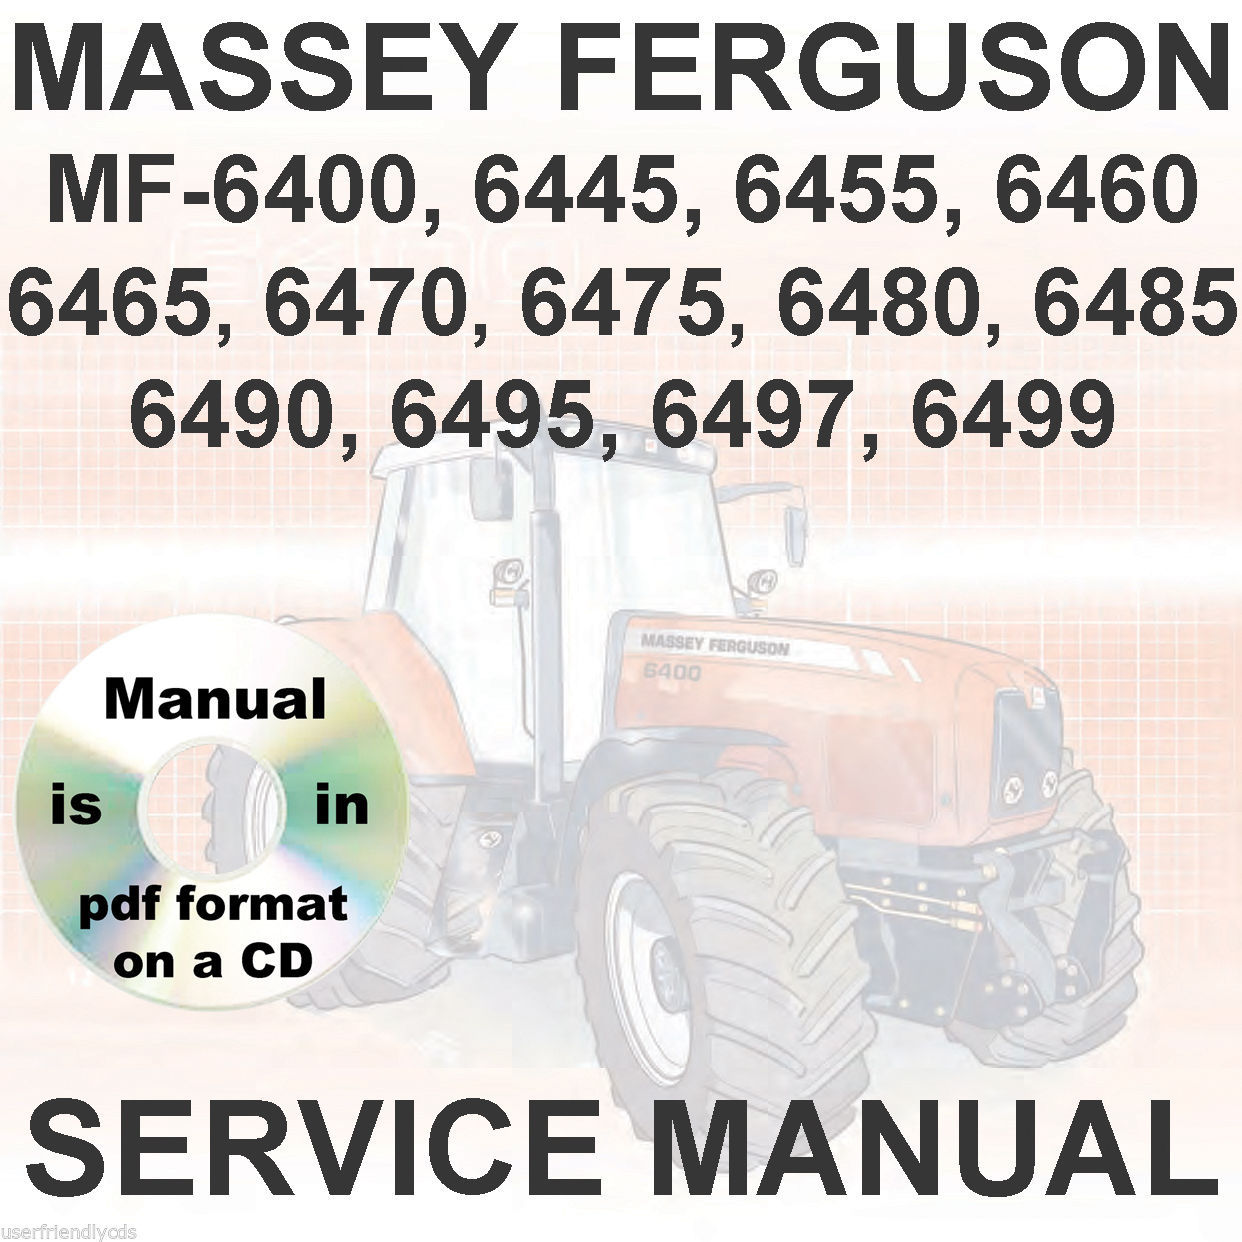 Massey Ferguson Tractors Service Manual and 21 similar items. 57